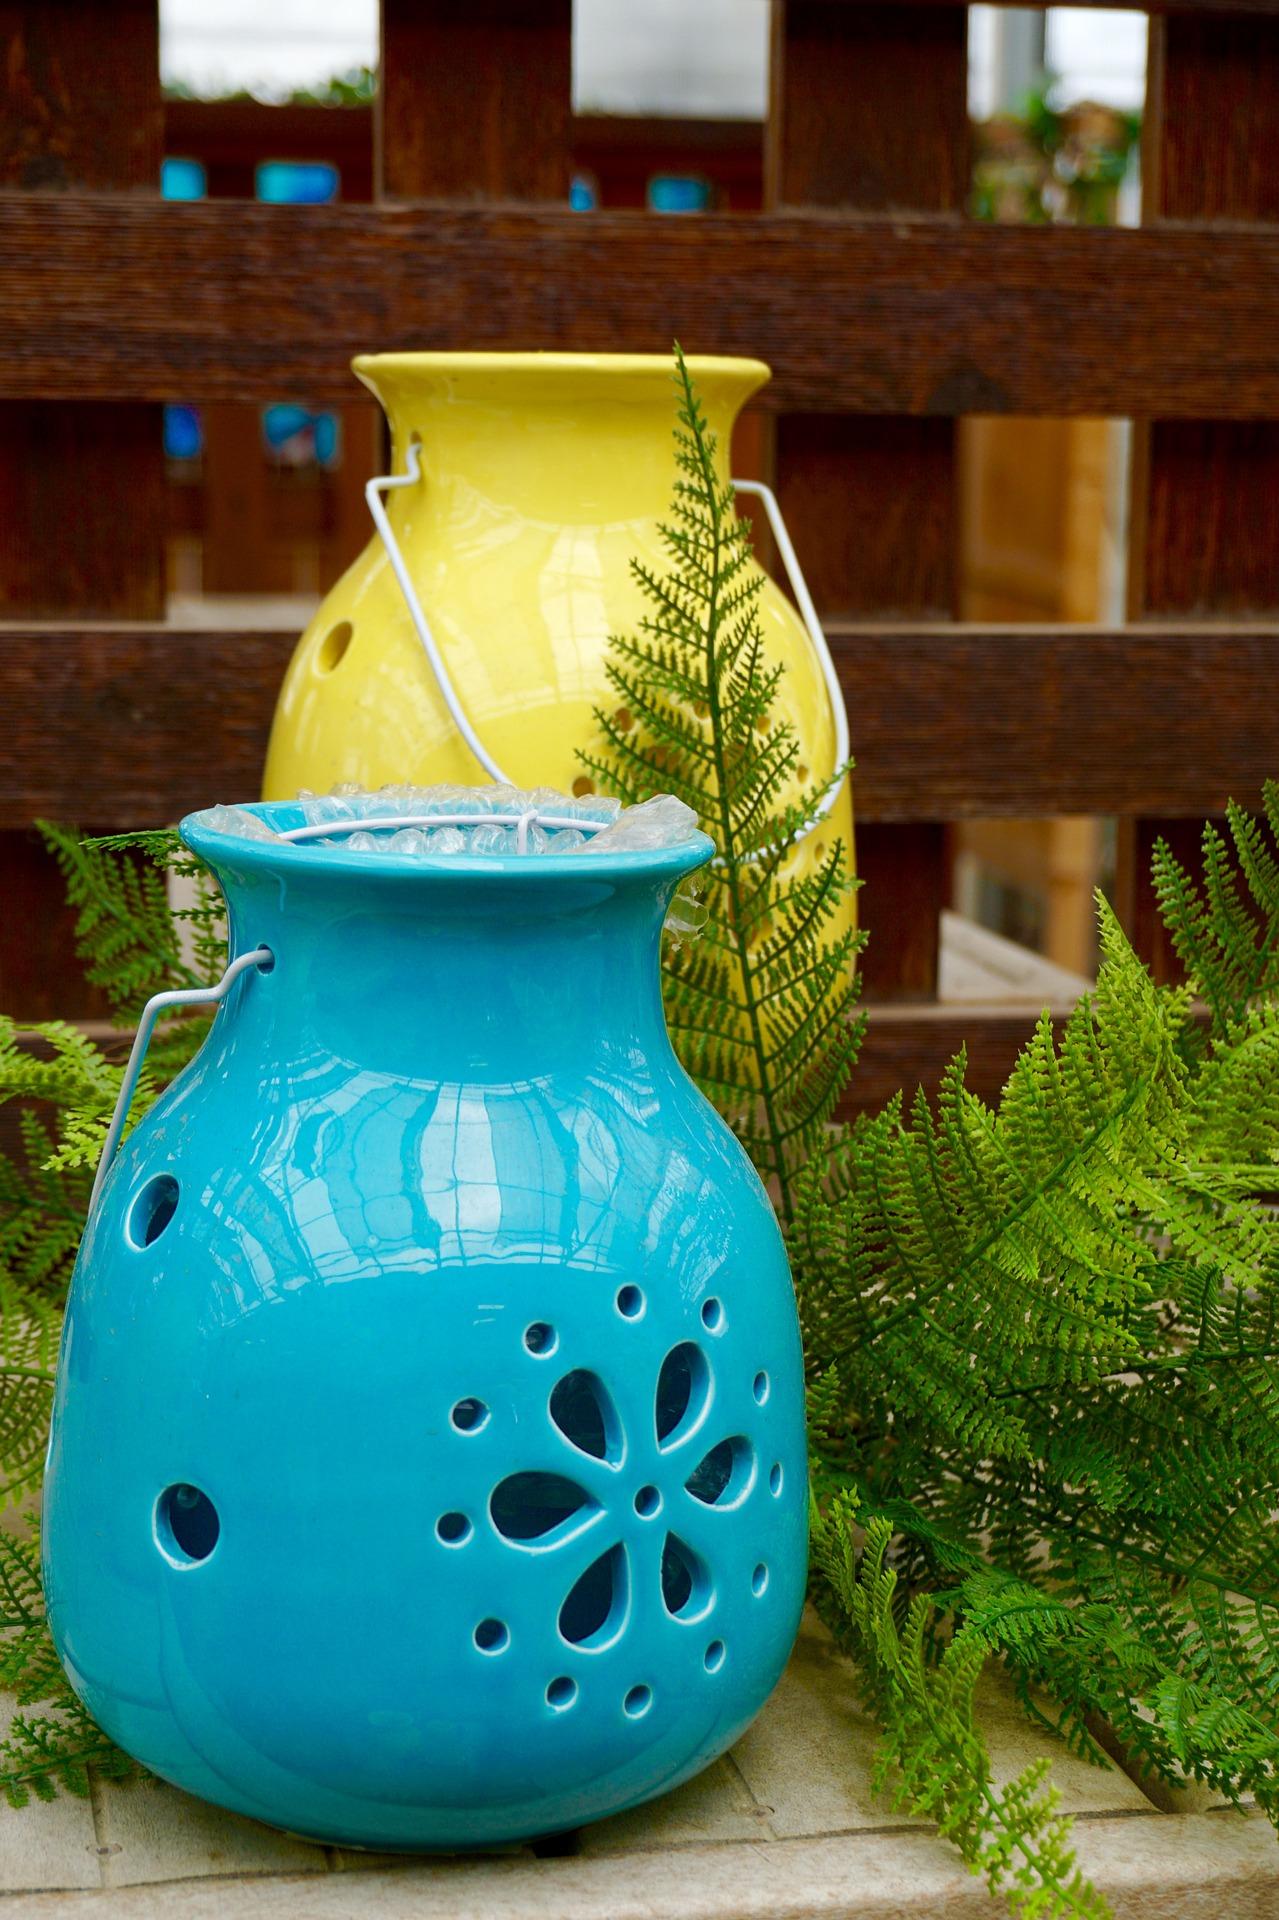 planters-1530571_1920.jpg